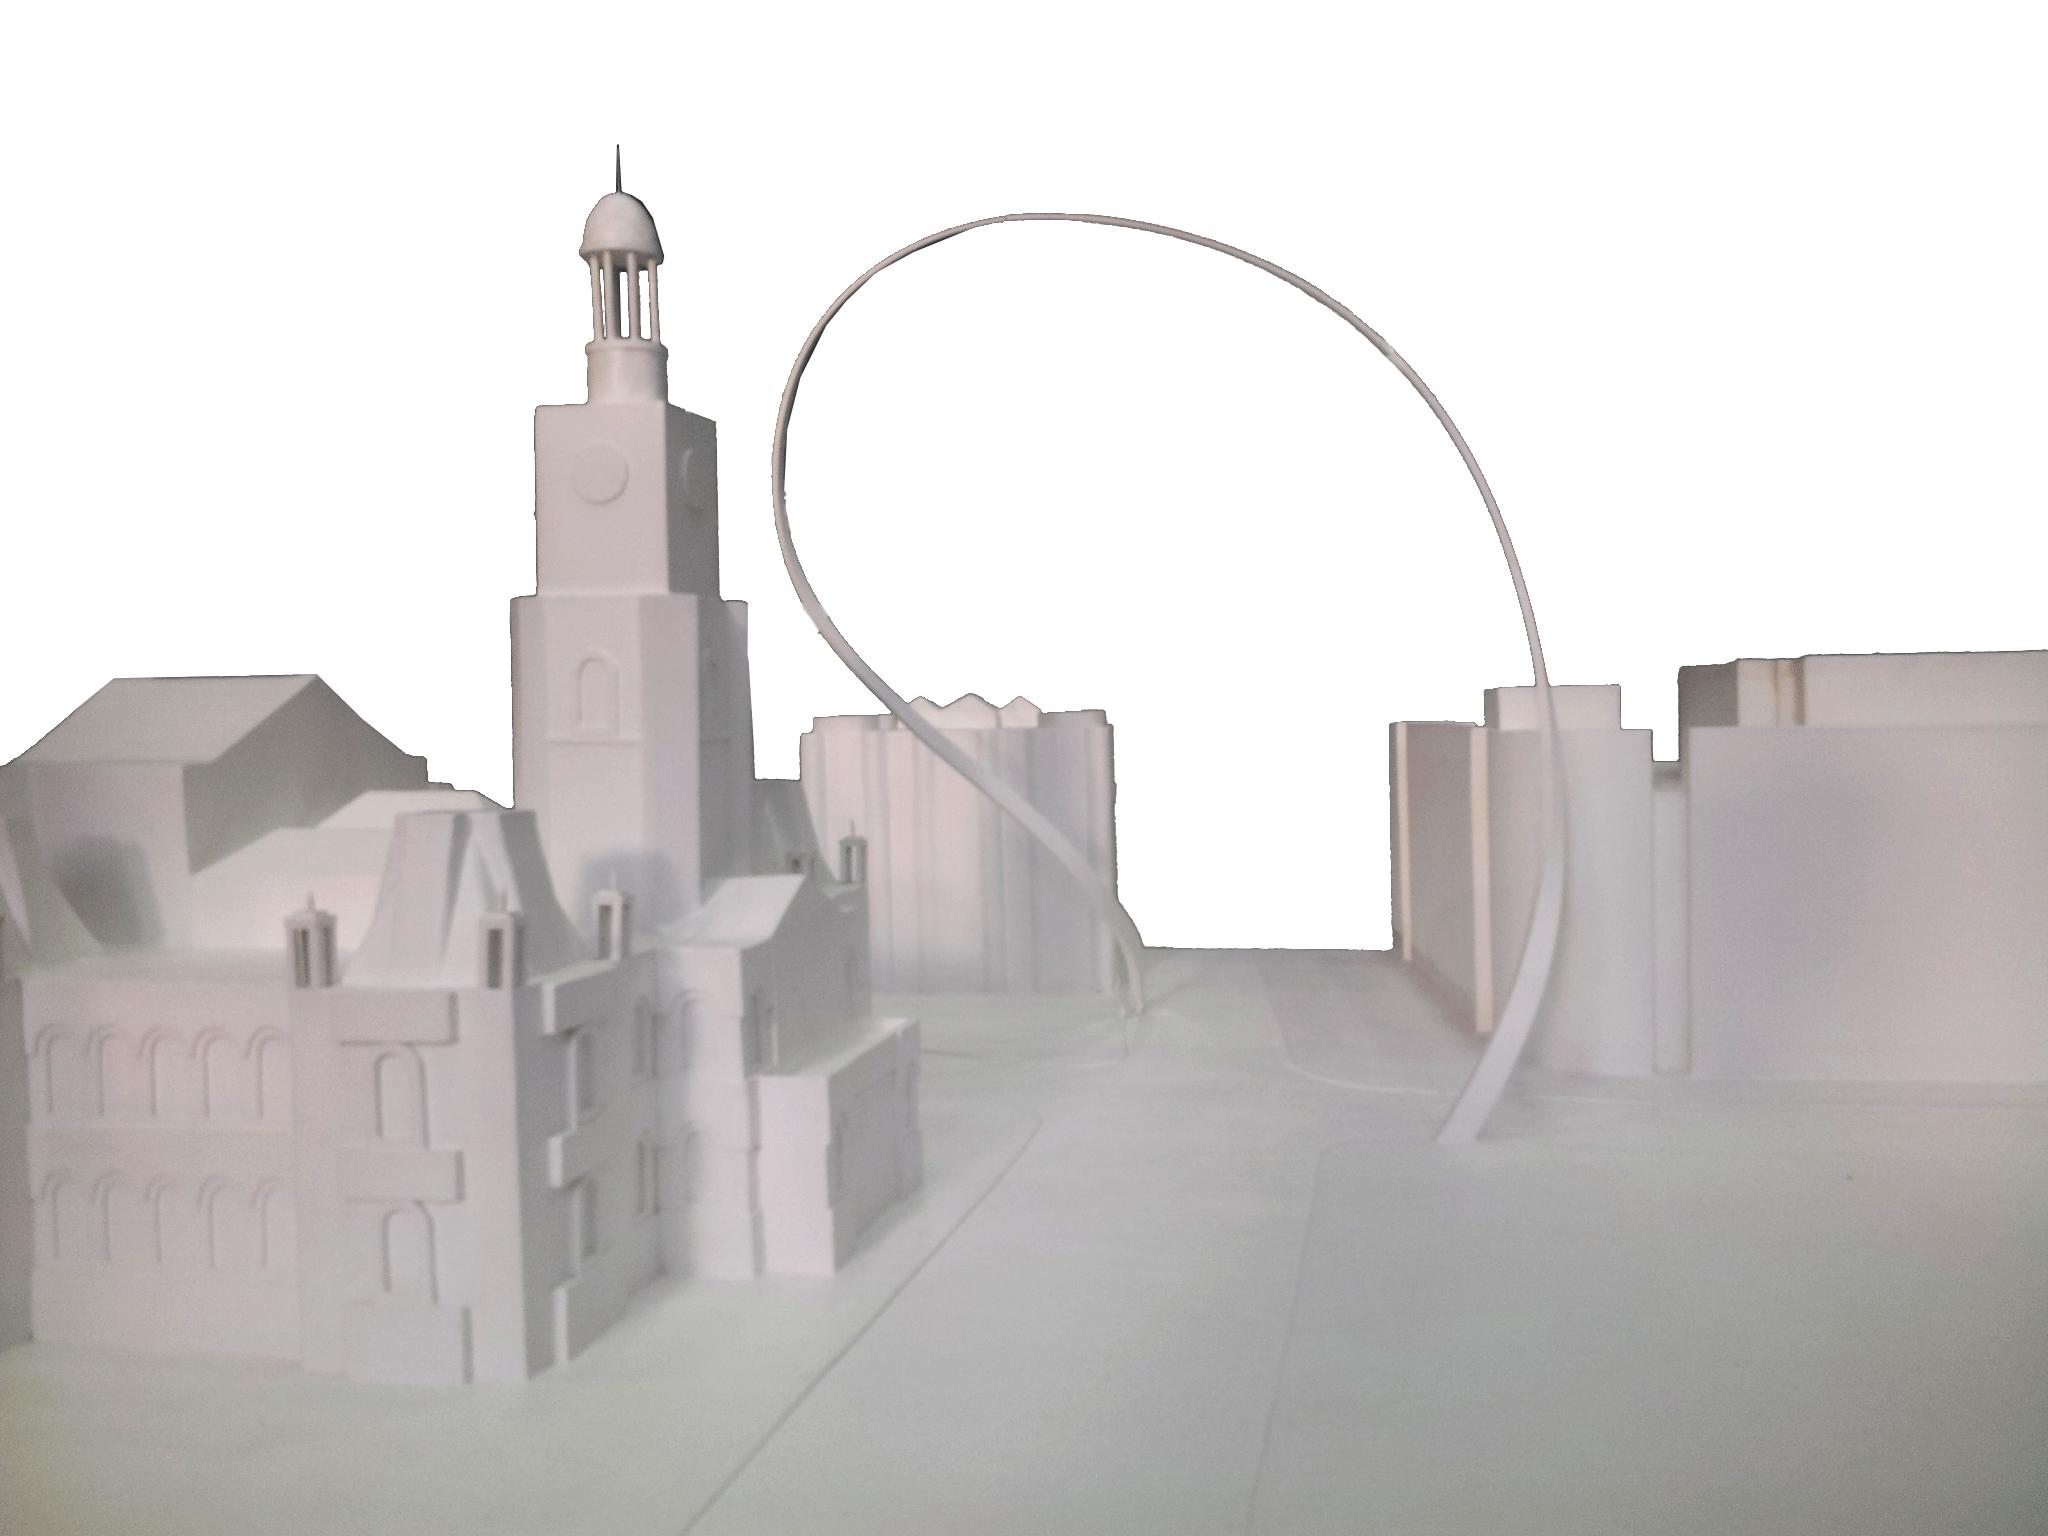 Junya-Ishigami-Freeing-Architecture-08